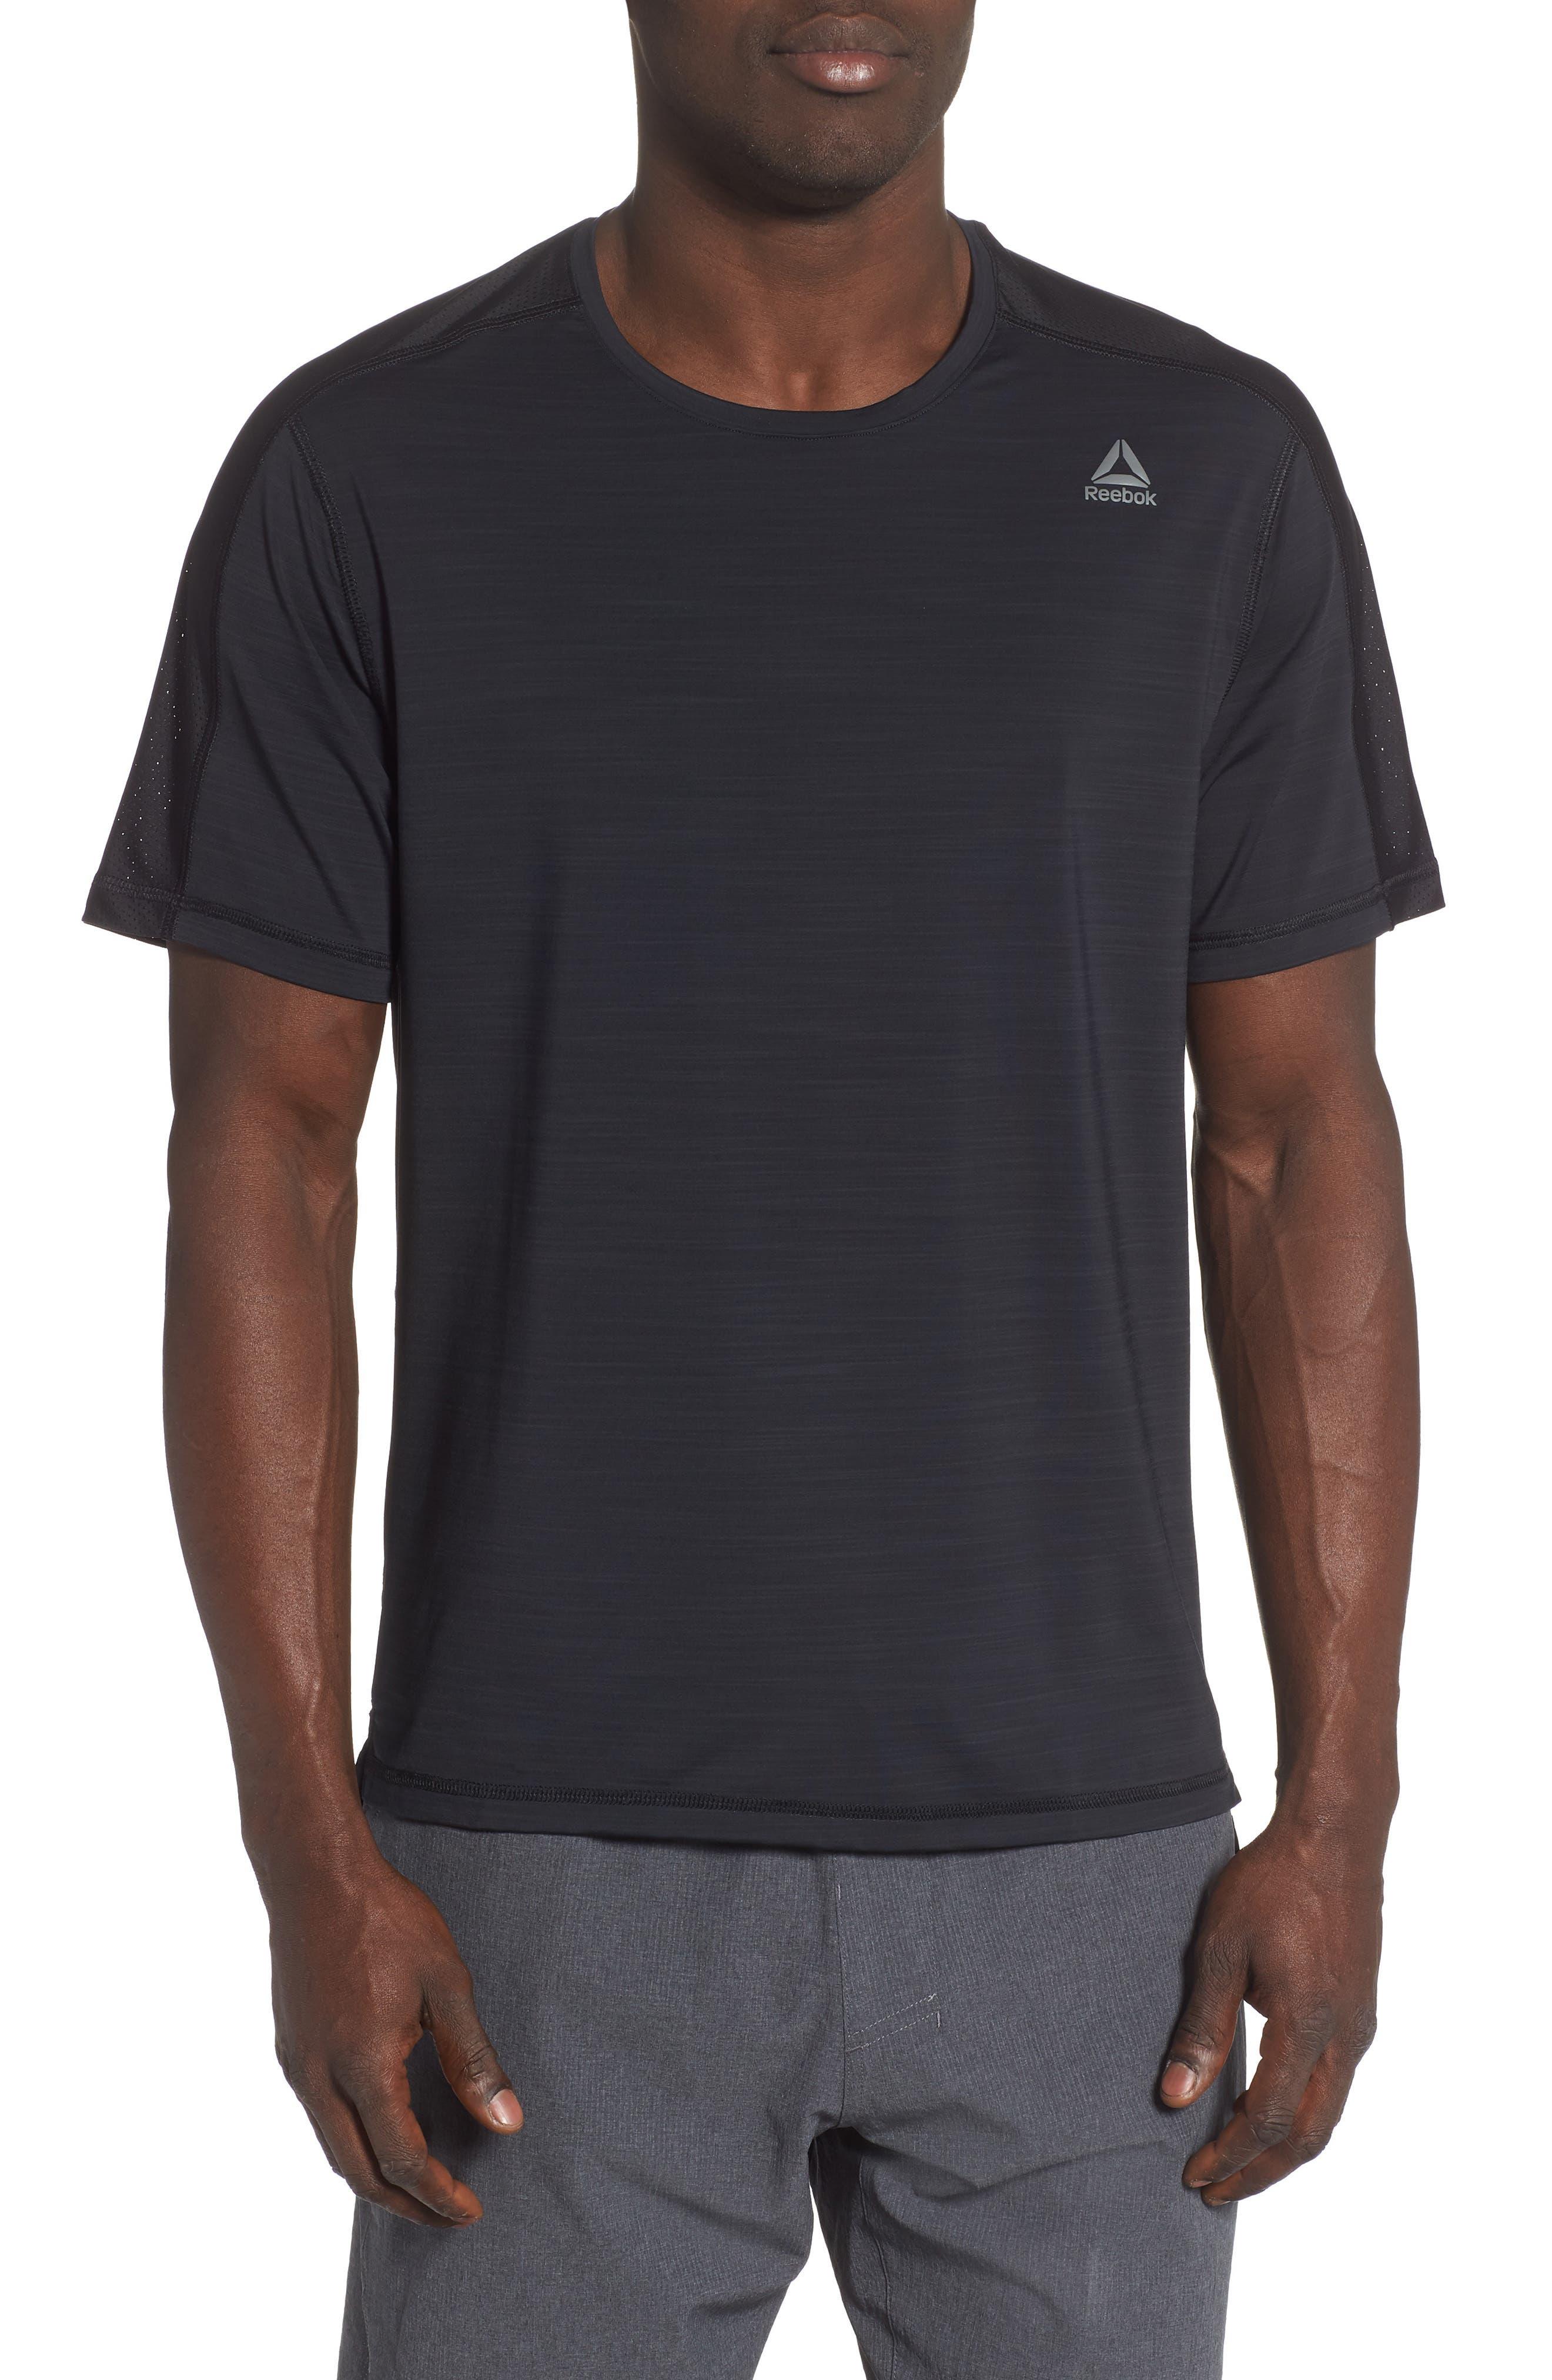 Reebok Ost Activchill Move T-Shirt, Black